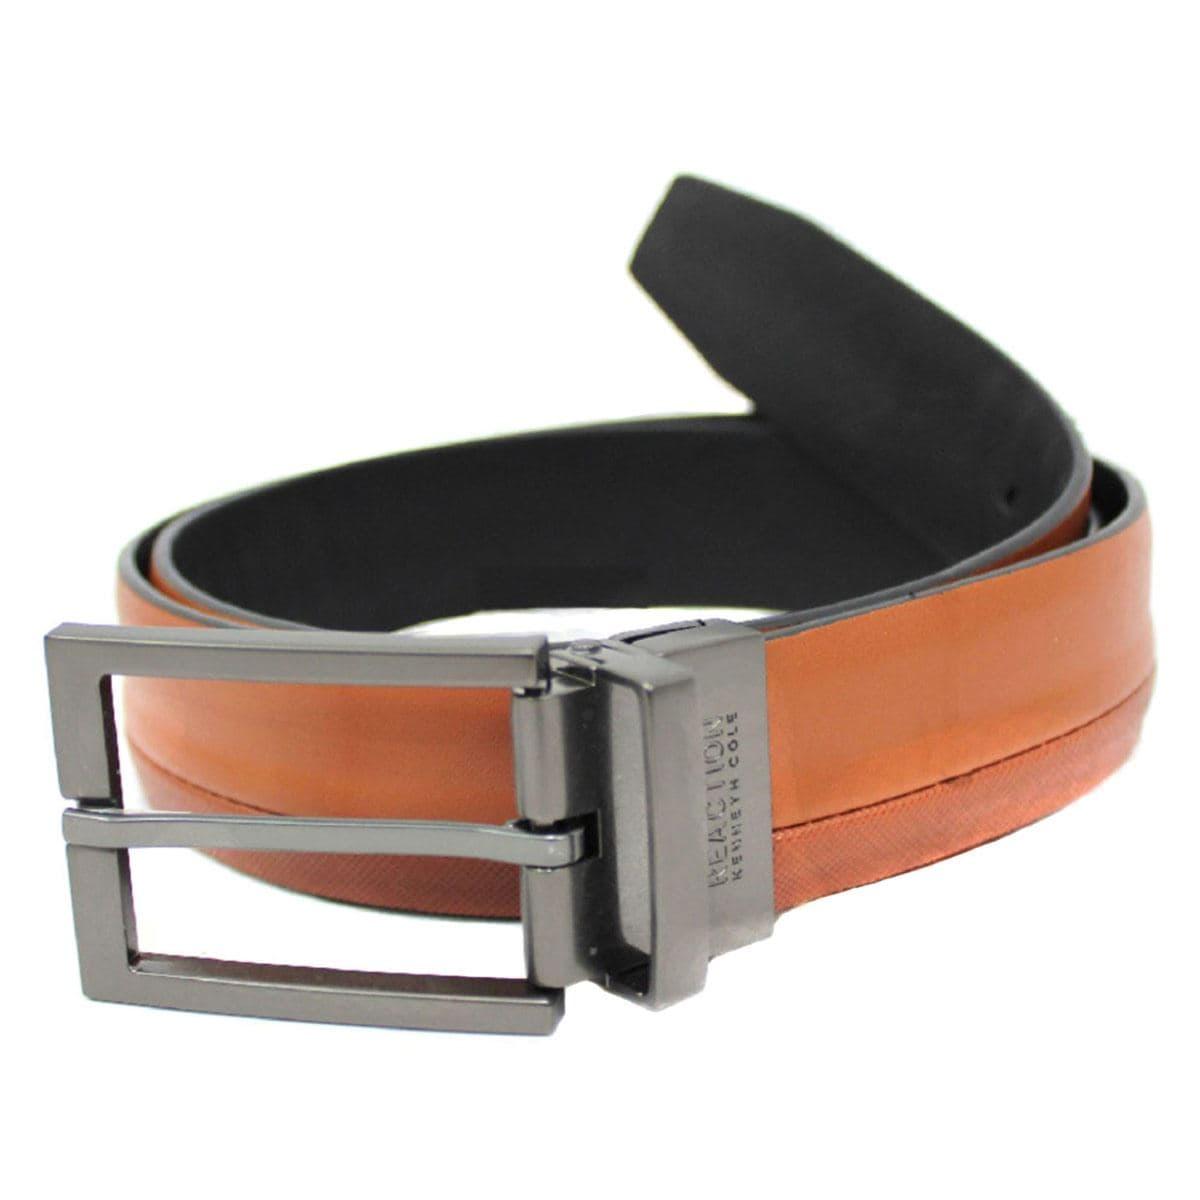 Cinturón T 34-36 Cognac/Negro K11-5005-0b Kenneth Cole